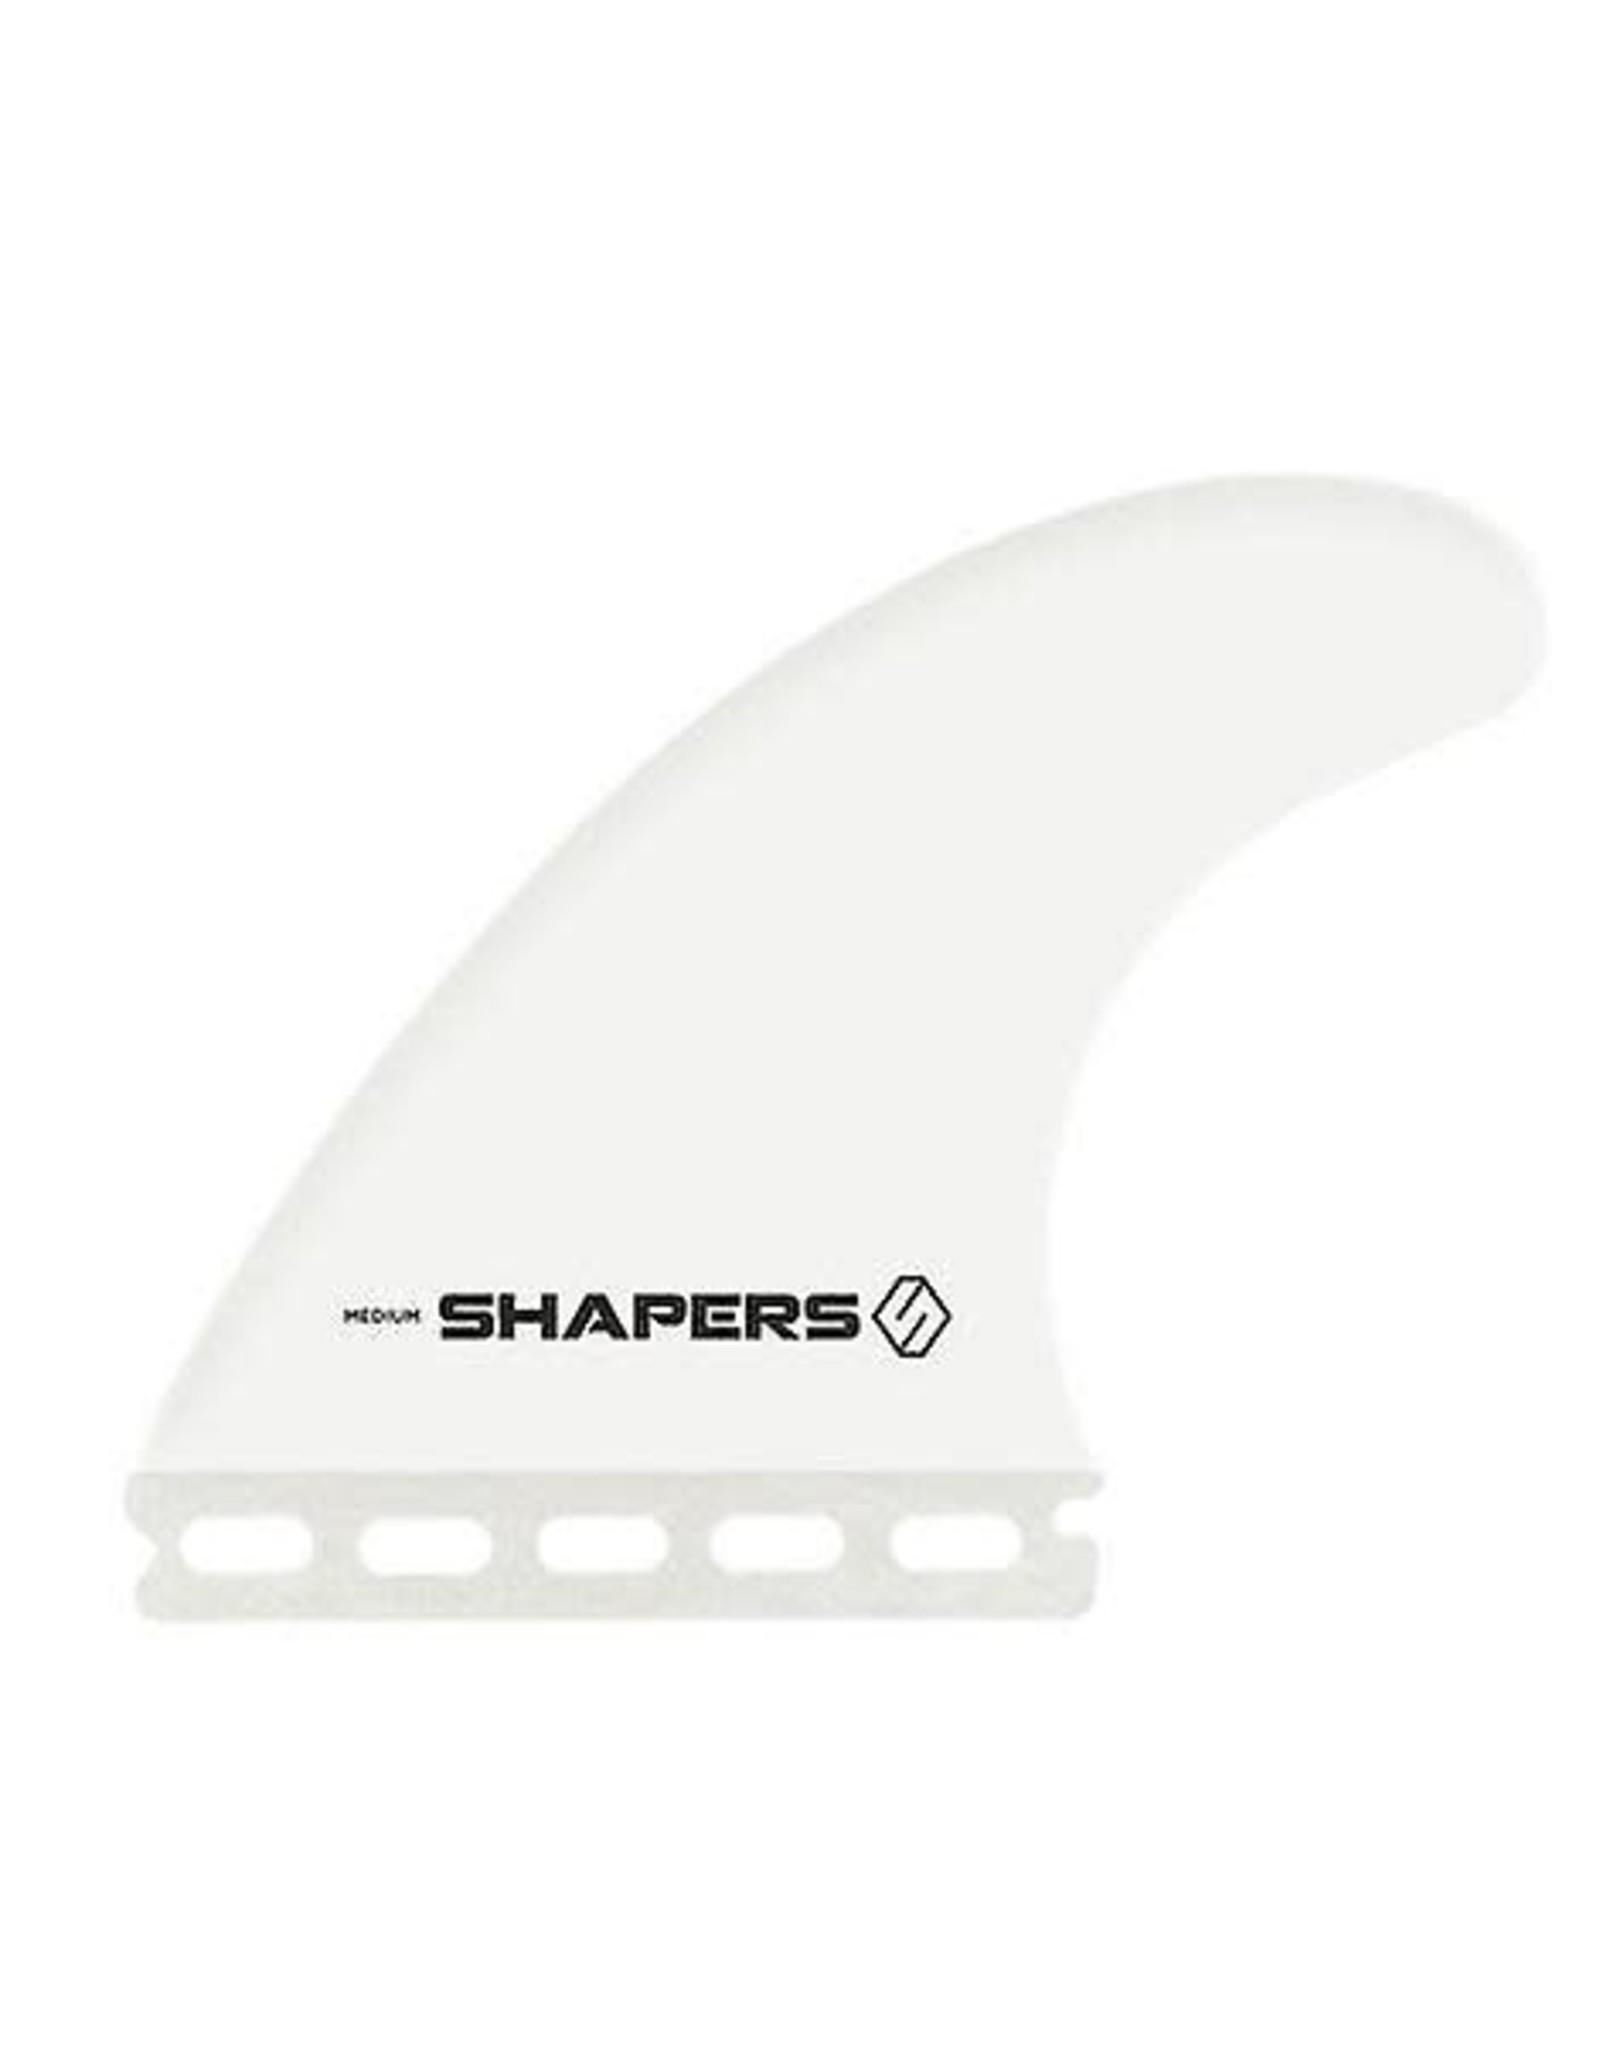 Shapers Shapers Fiberflex Thruster Futures Fin Set Large